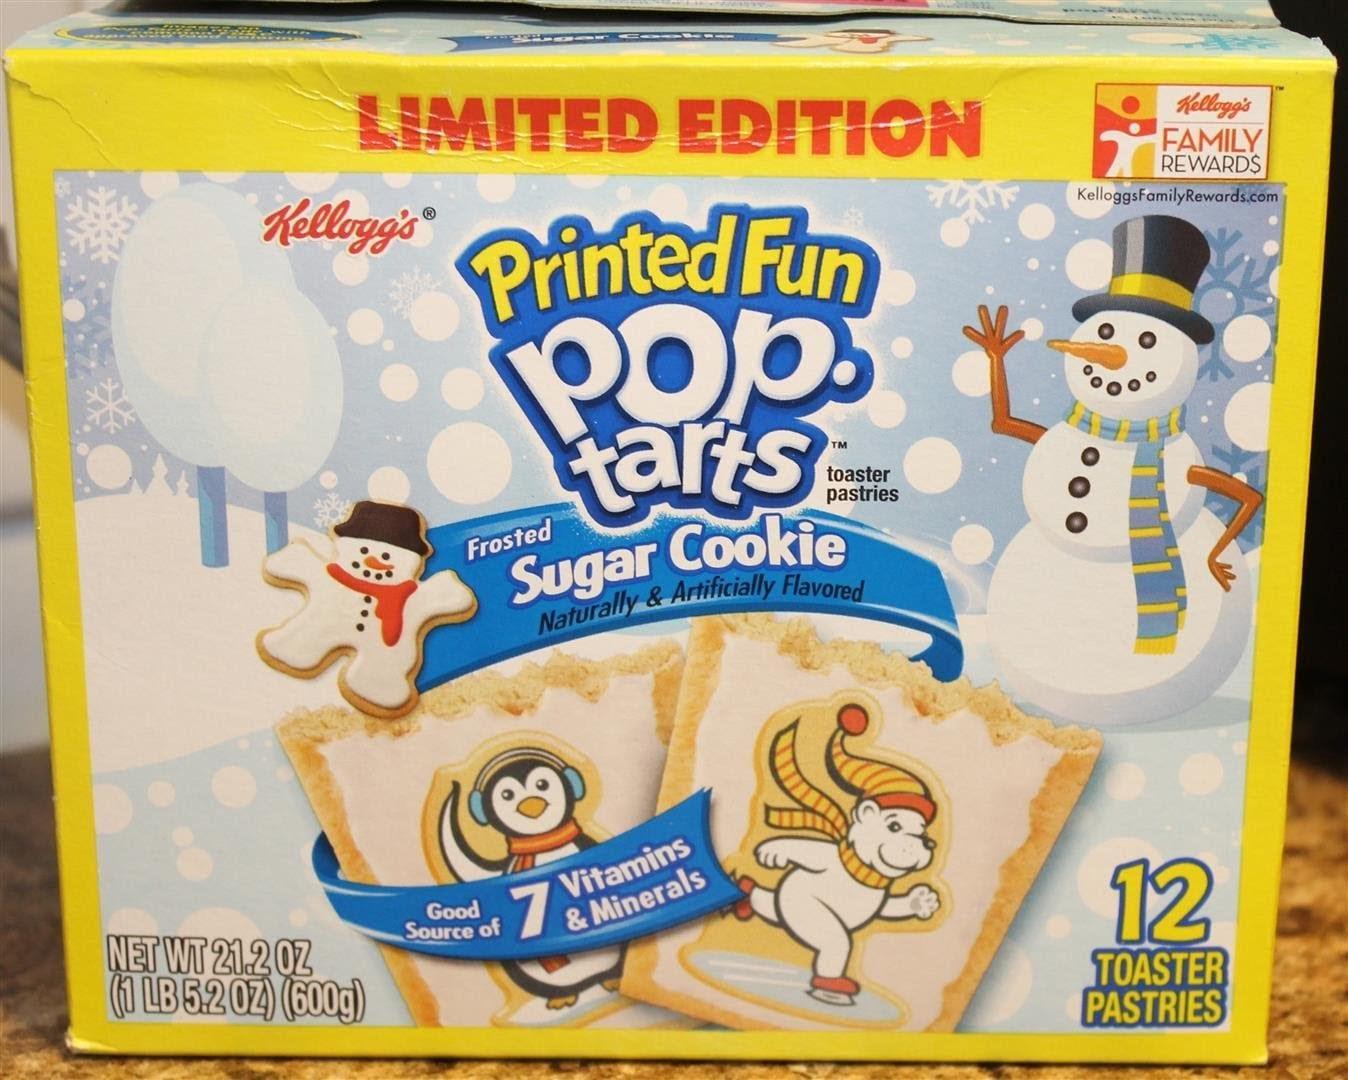 Sugar Cookie Pop Tarts Taste Test & Review